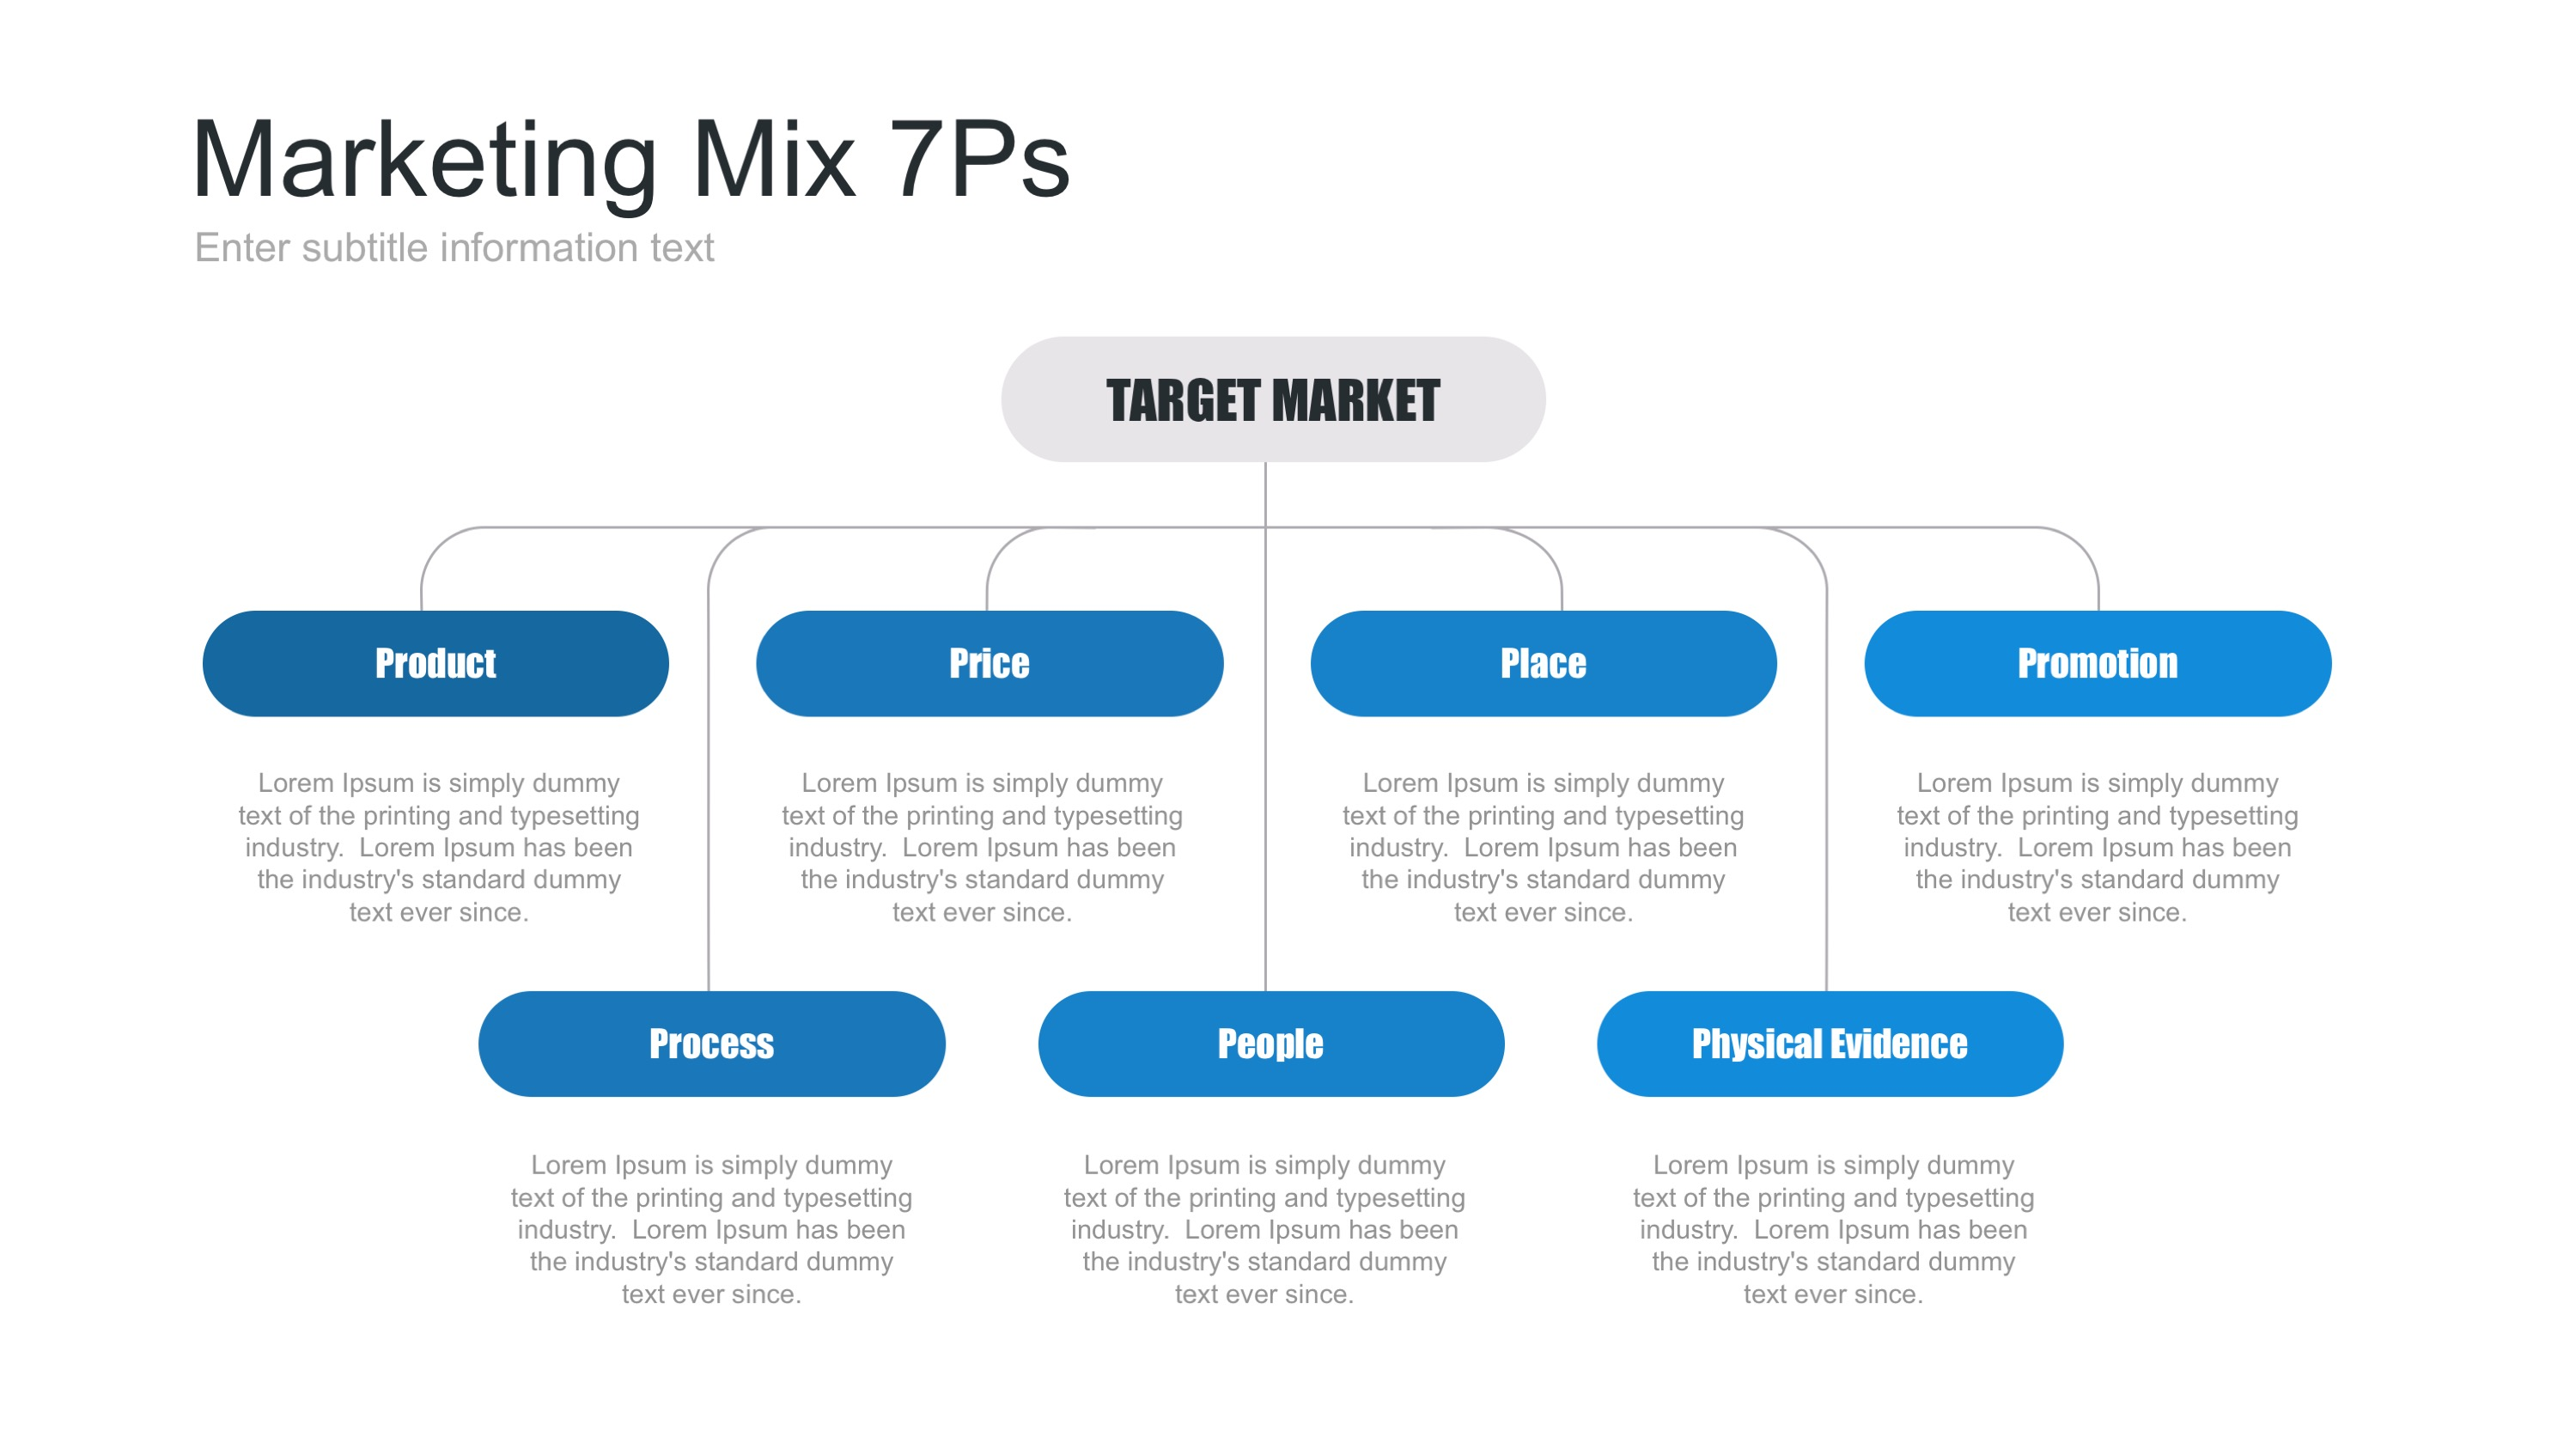 Marketing Plan of Colgate-Palmolive